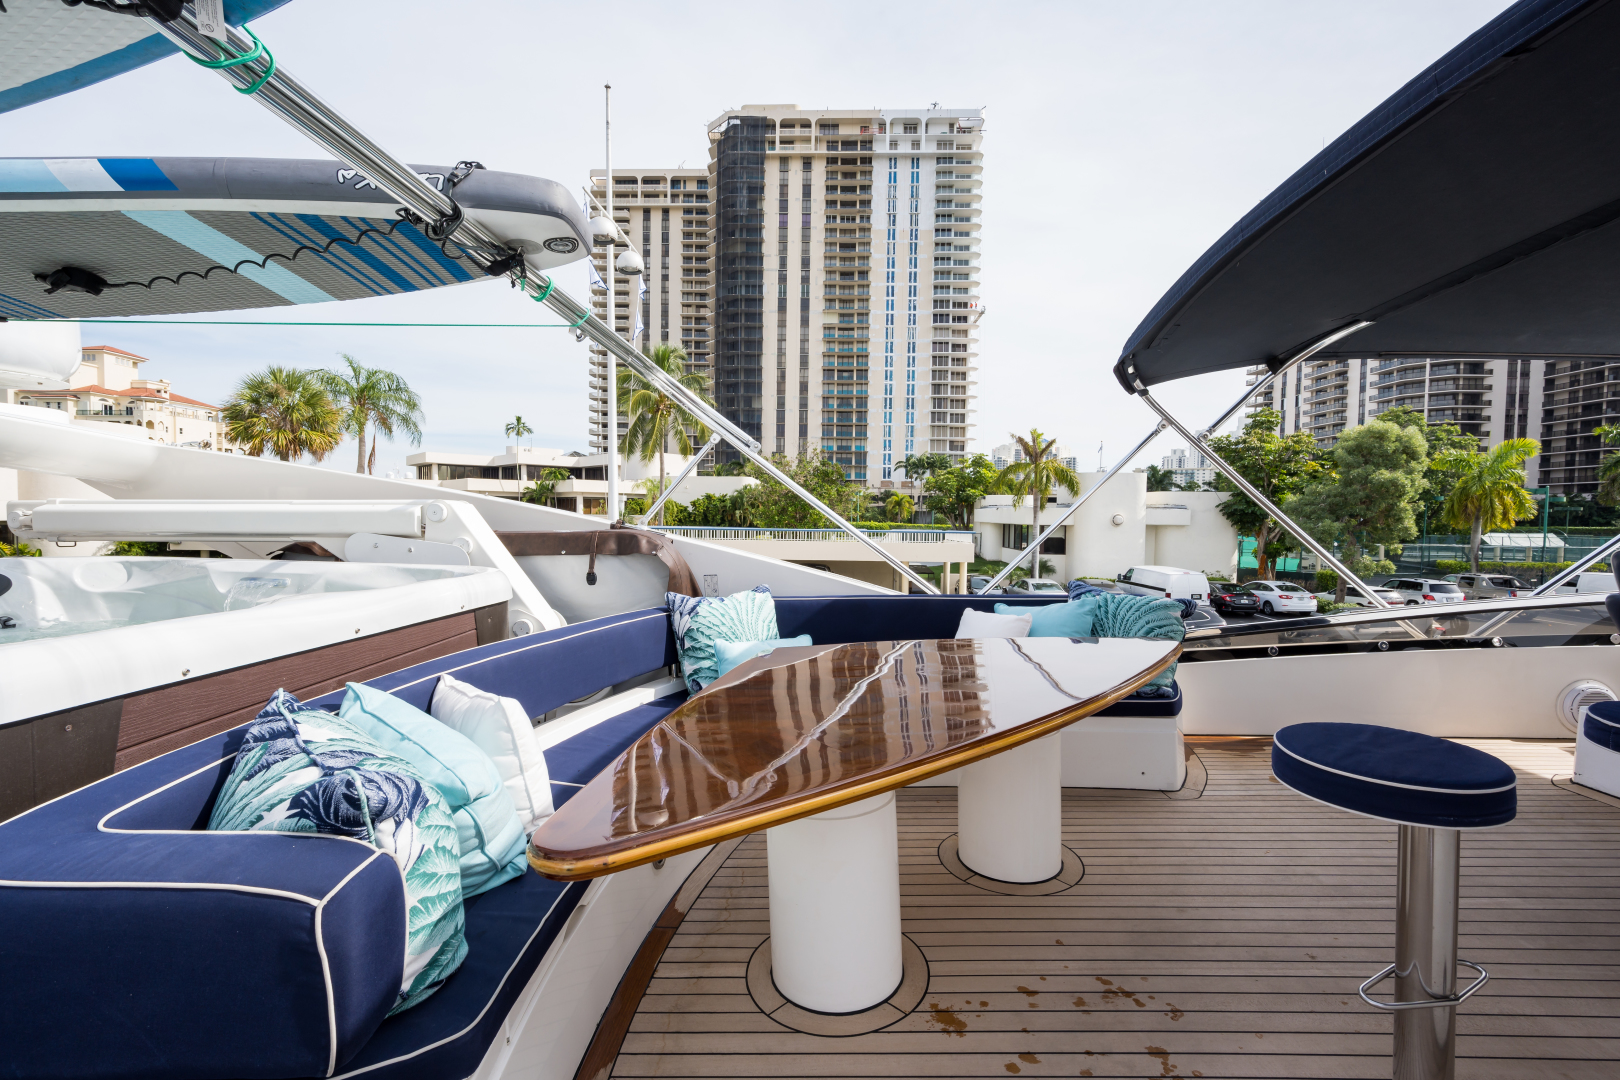 Sunseeker-Yacht 2004-TOP GUN Aventura-Florida-United States-1450716 | Thumbnail